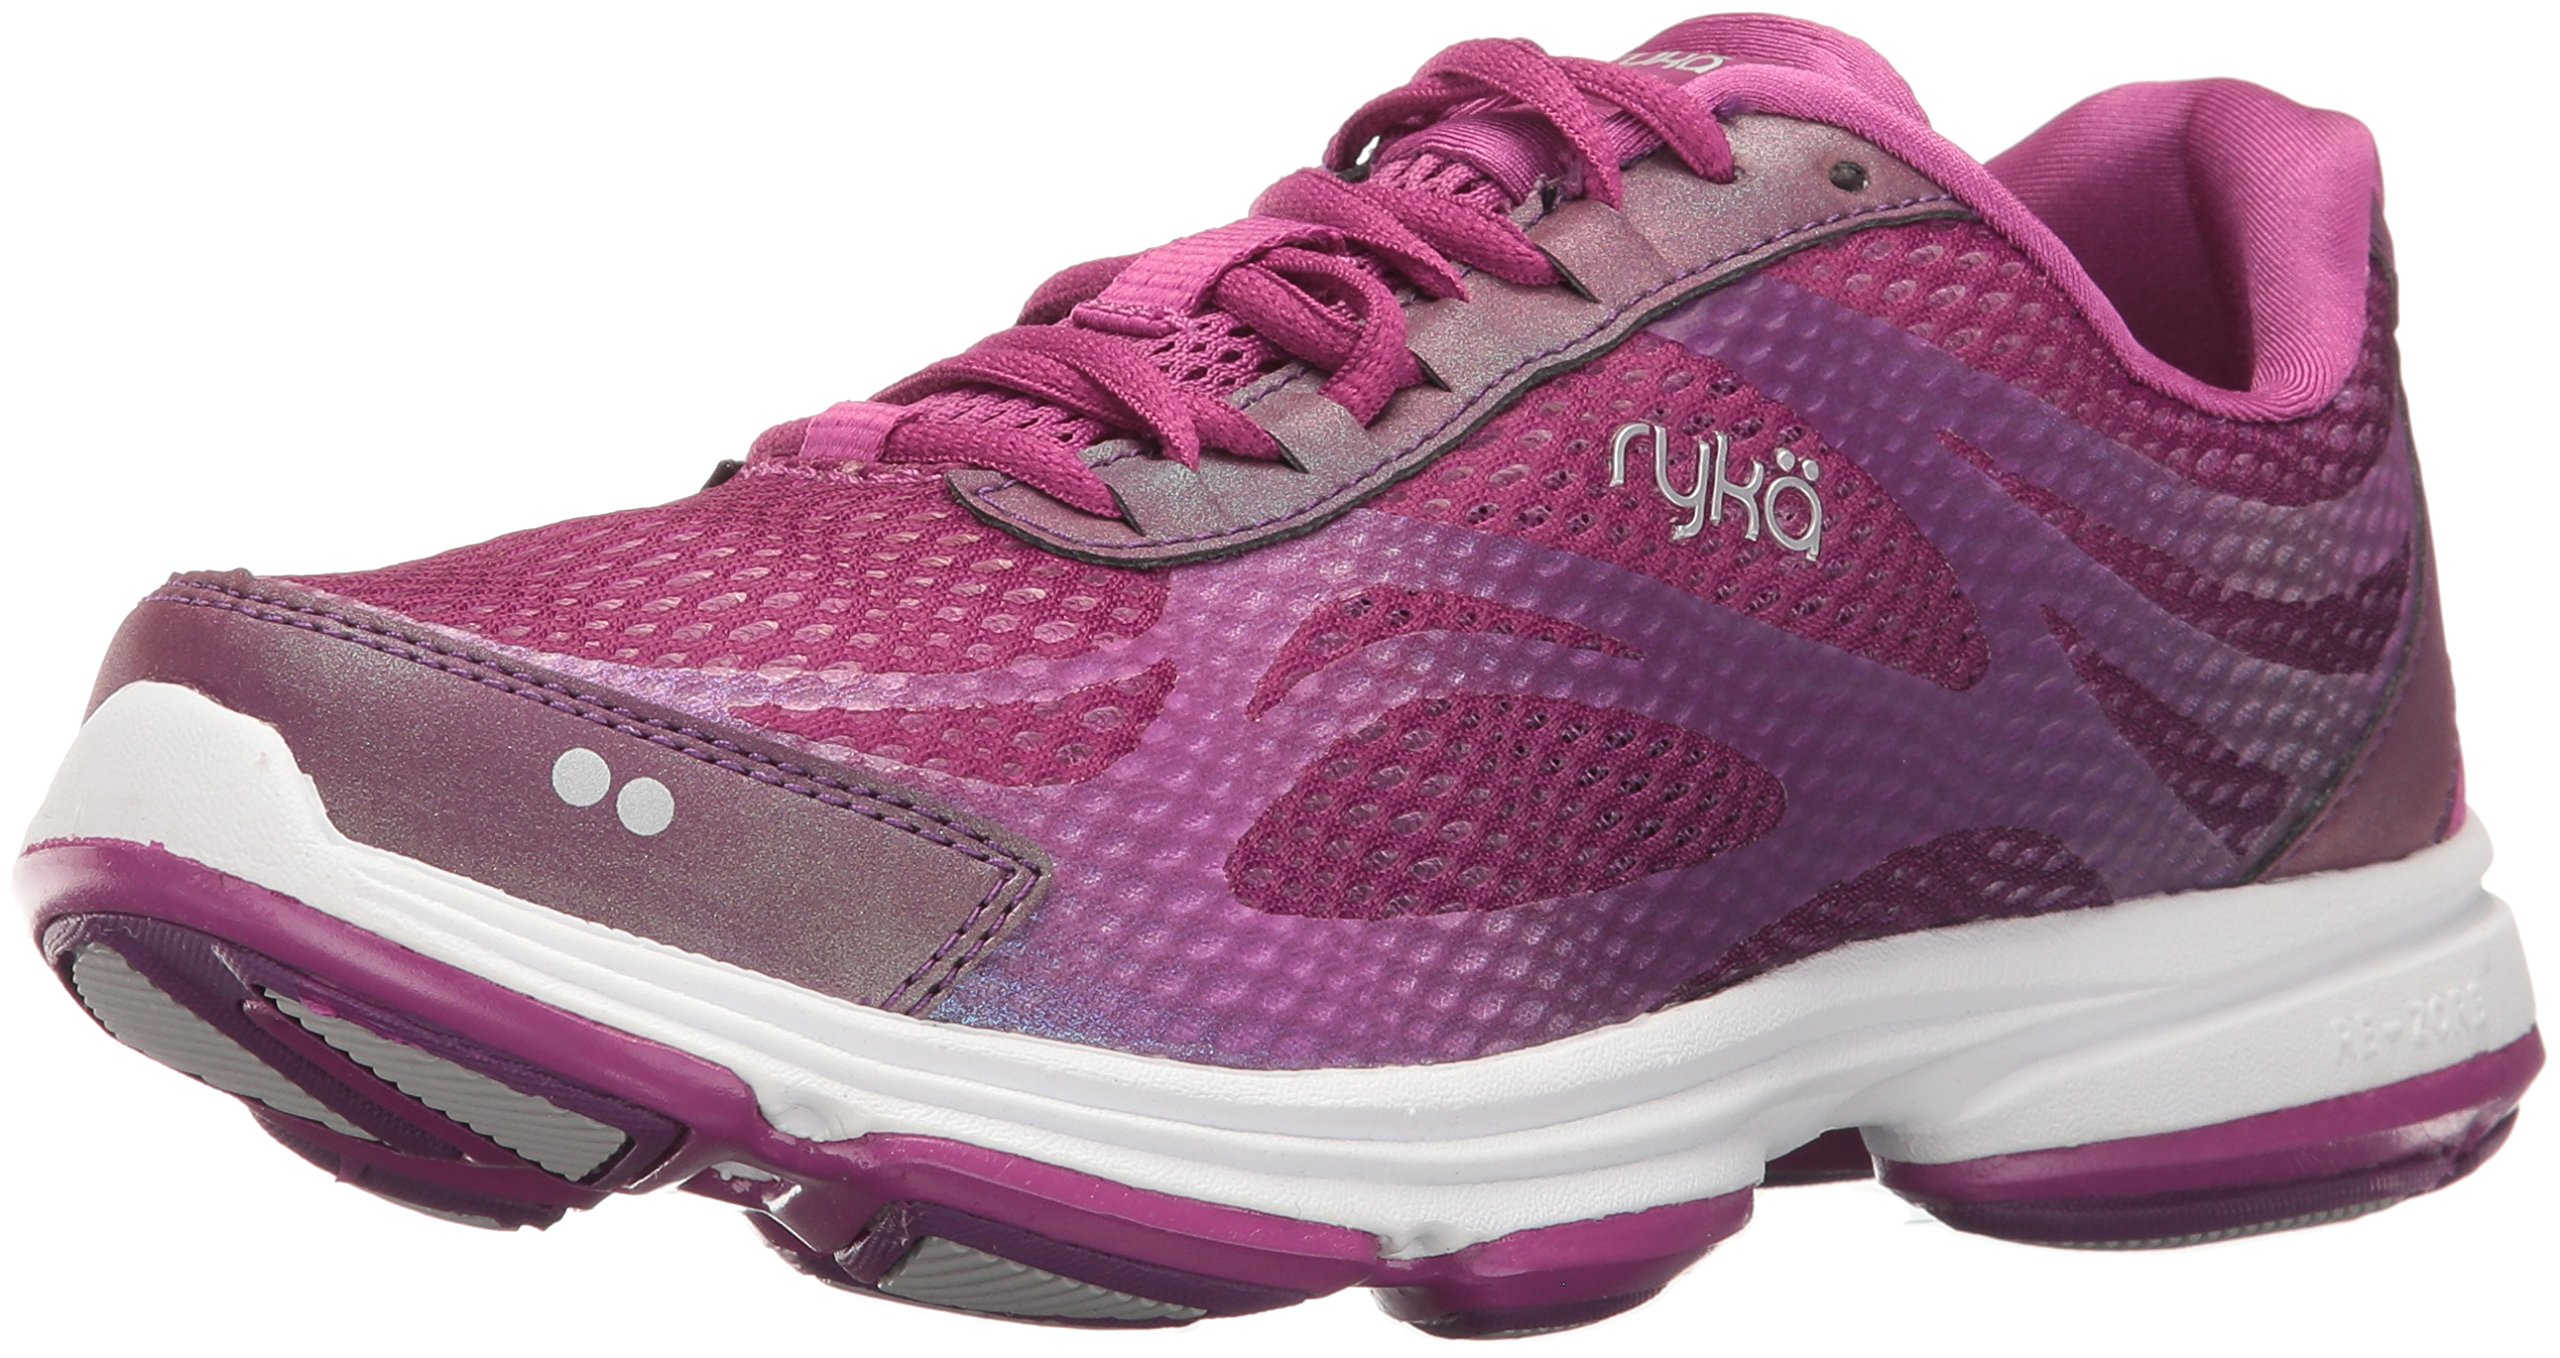 Ryka Women's Devotion Plus 2 Cross Trainer,Grape Juice/Vivid Berry/Chrome Silver by Ryka (Image #1)